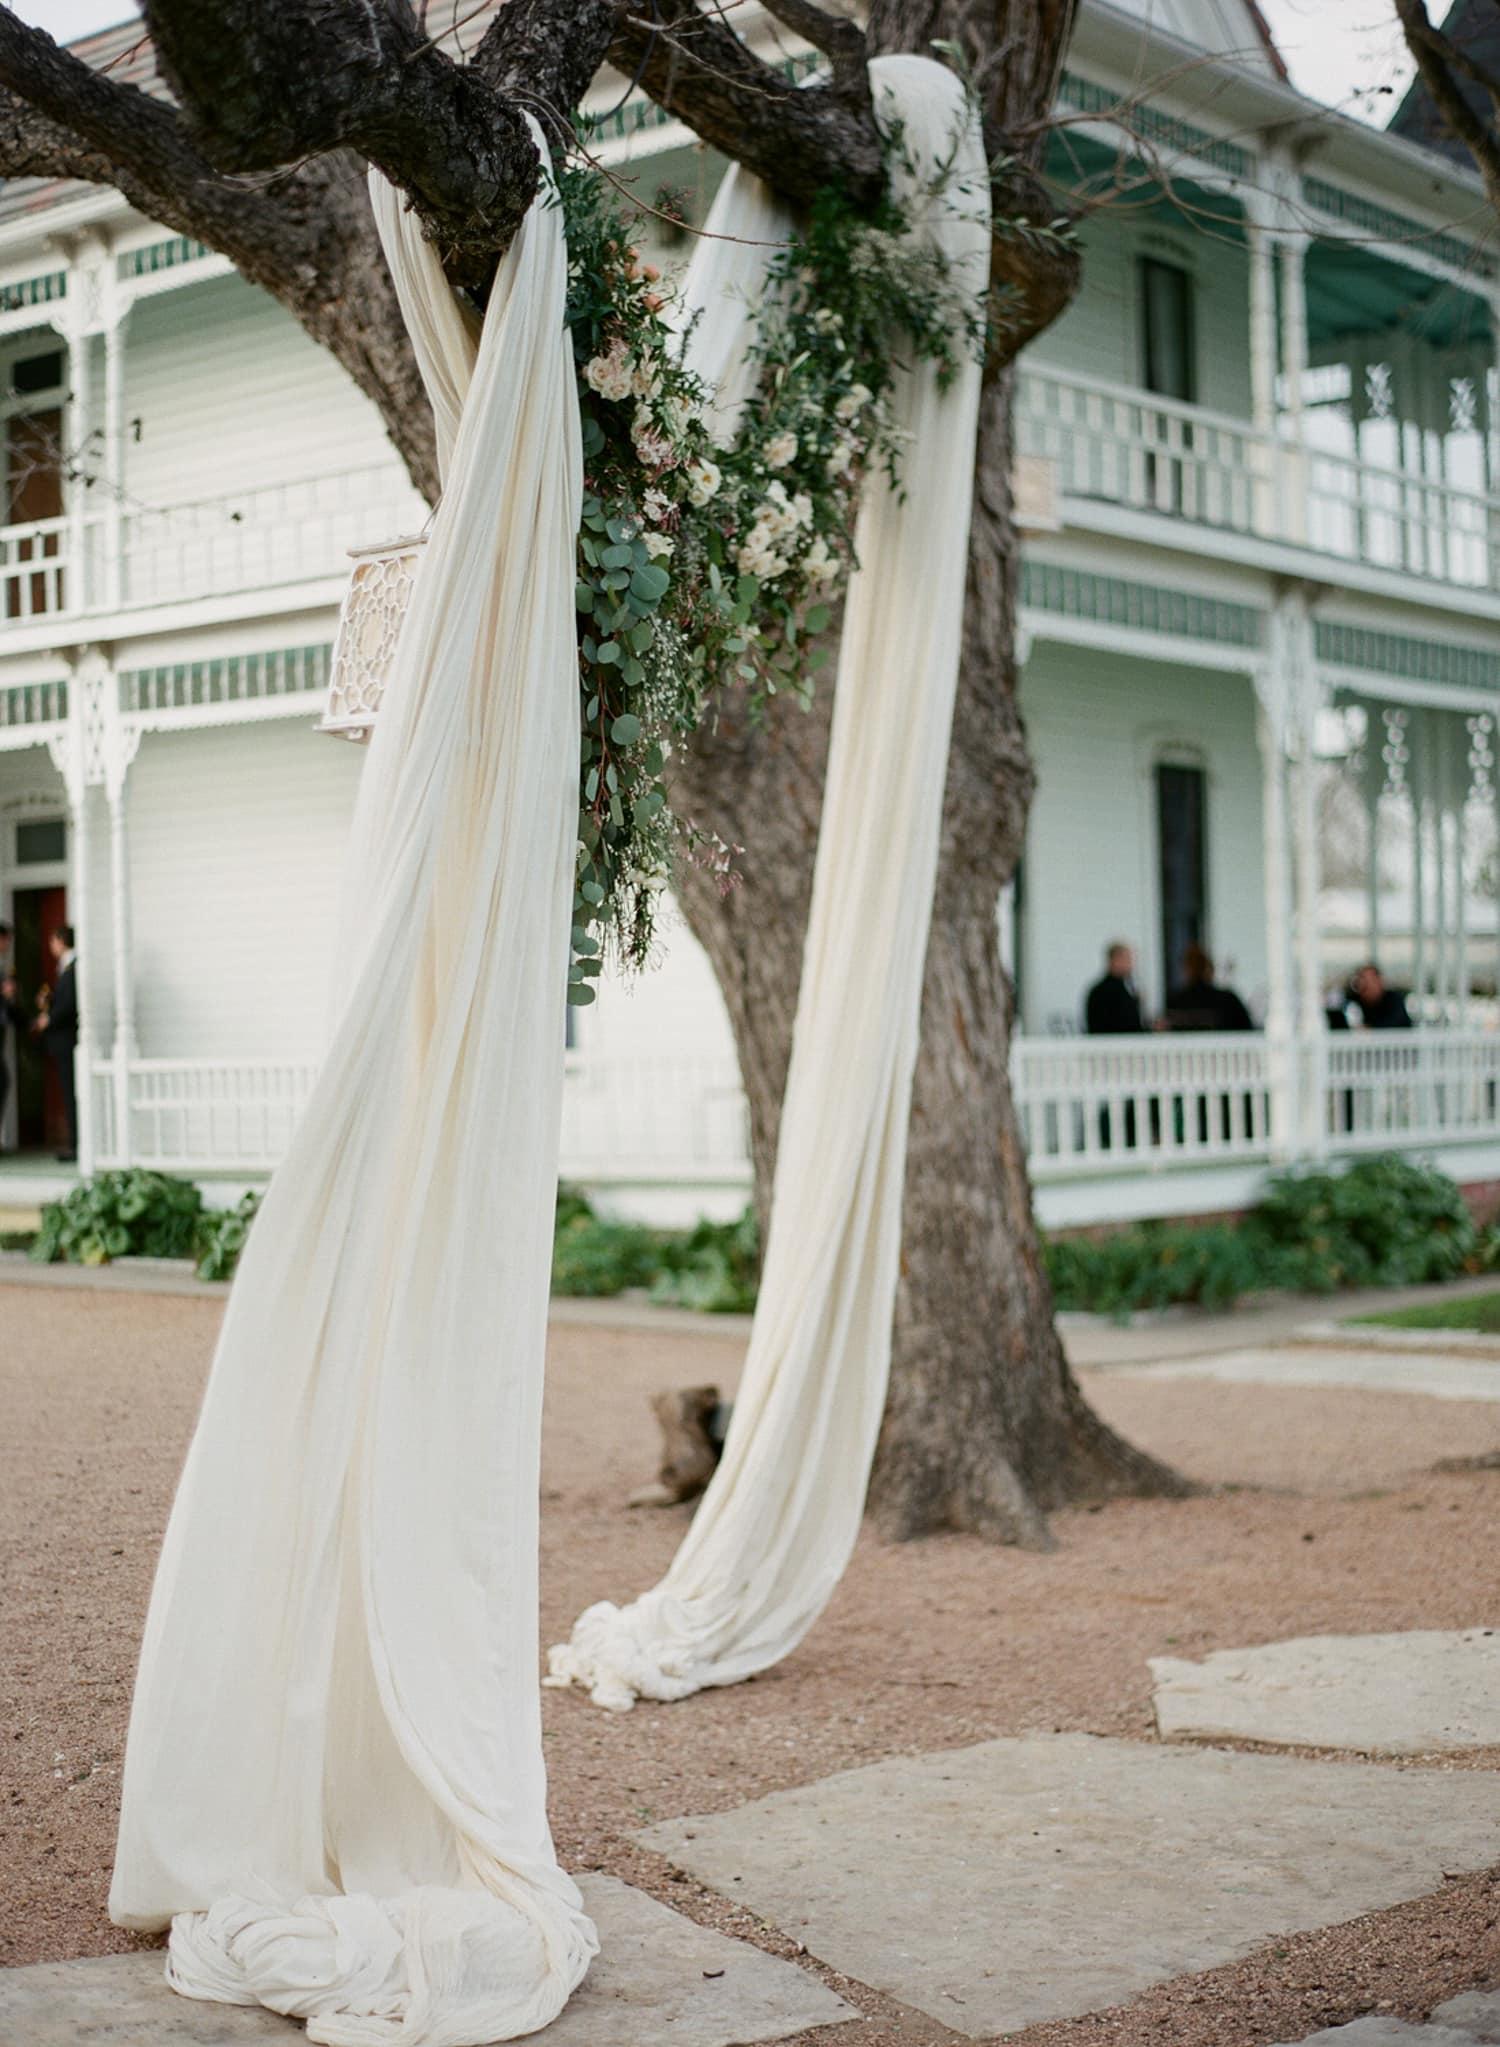 barr-mansion-wedding-8.jpg